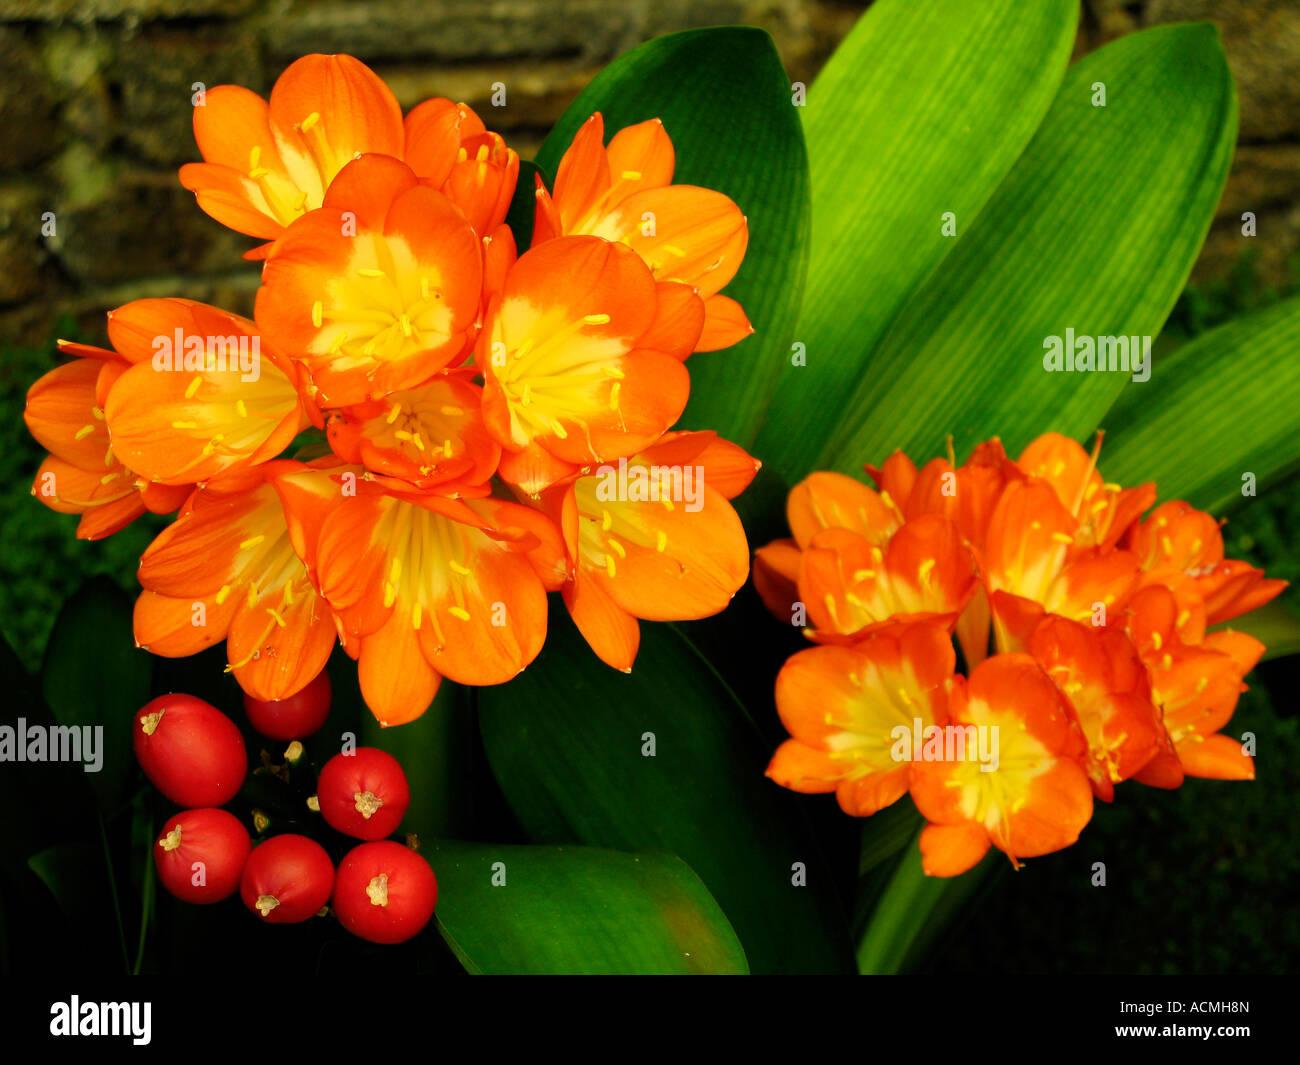 Kaffir lily Clivia miniata Regel, flower, France, Europe - Stock Image